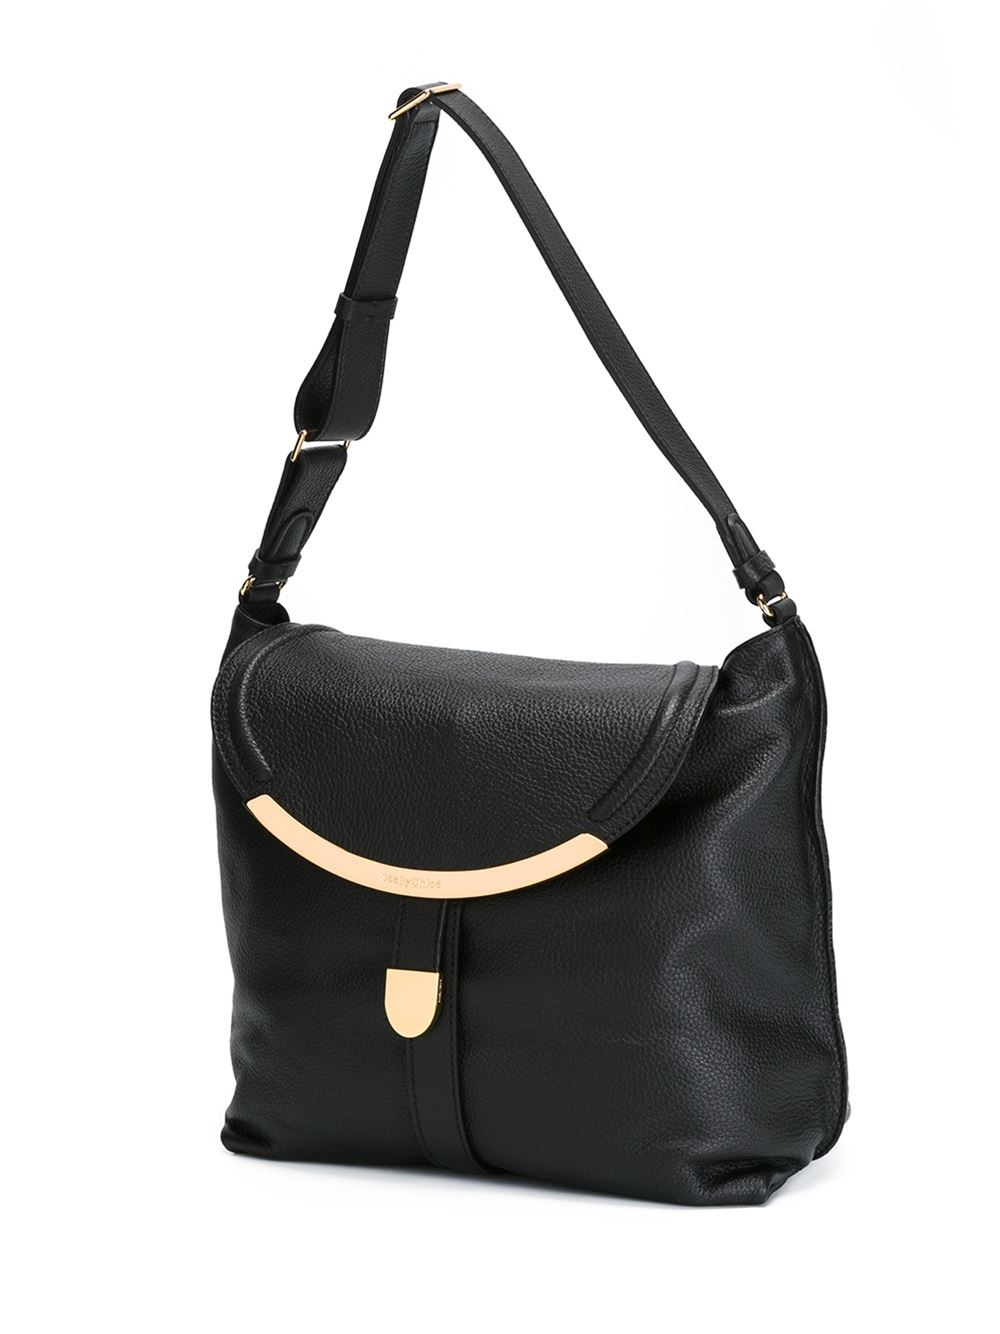 See by chloé 'Lizzie' Shoulder Bag in Black | Lyst